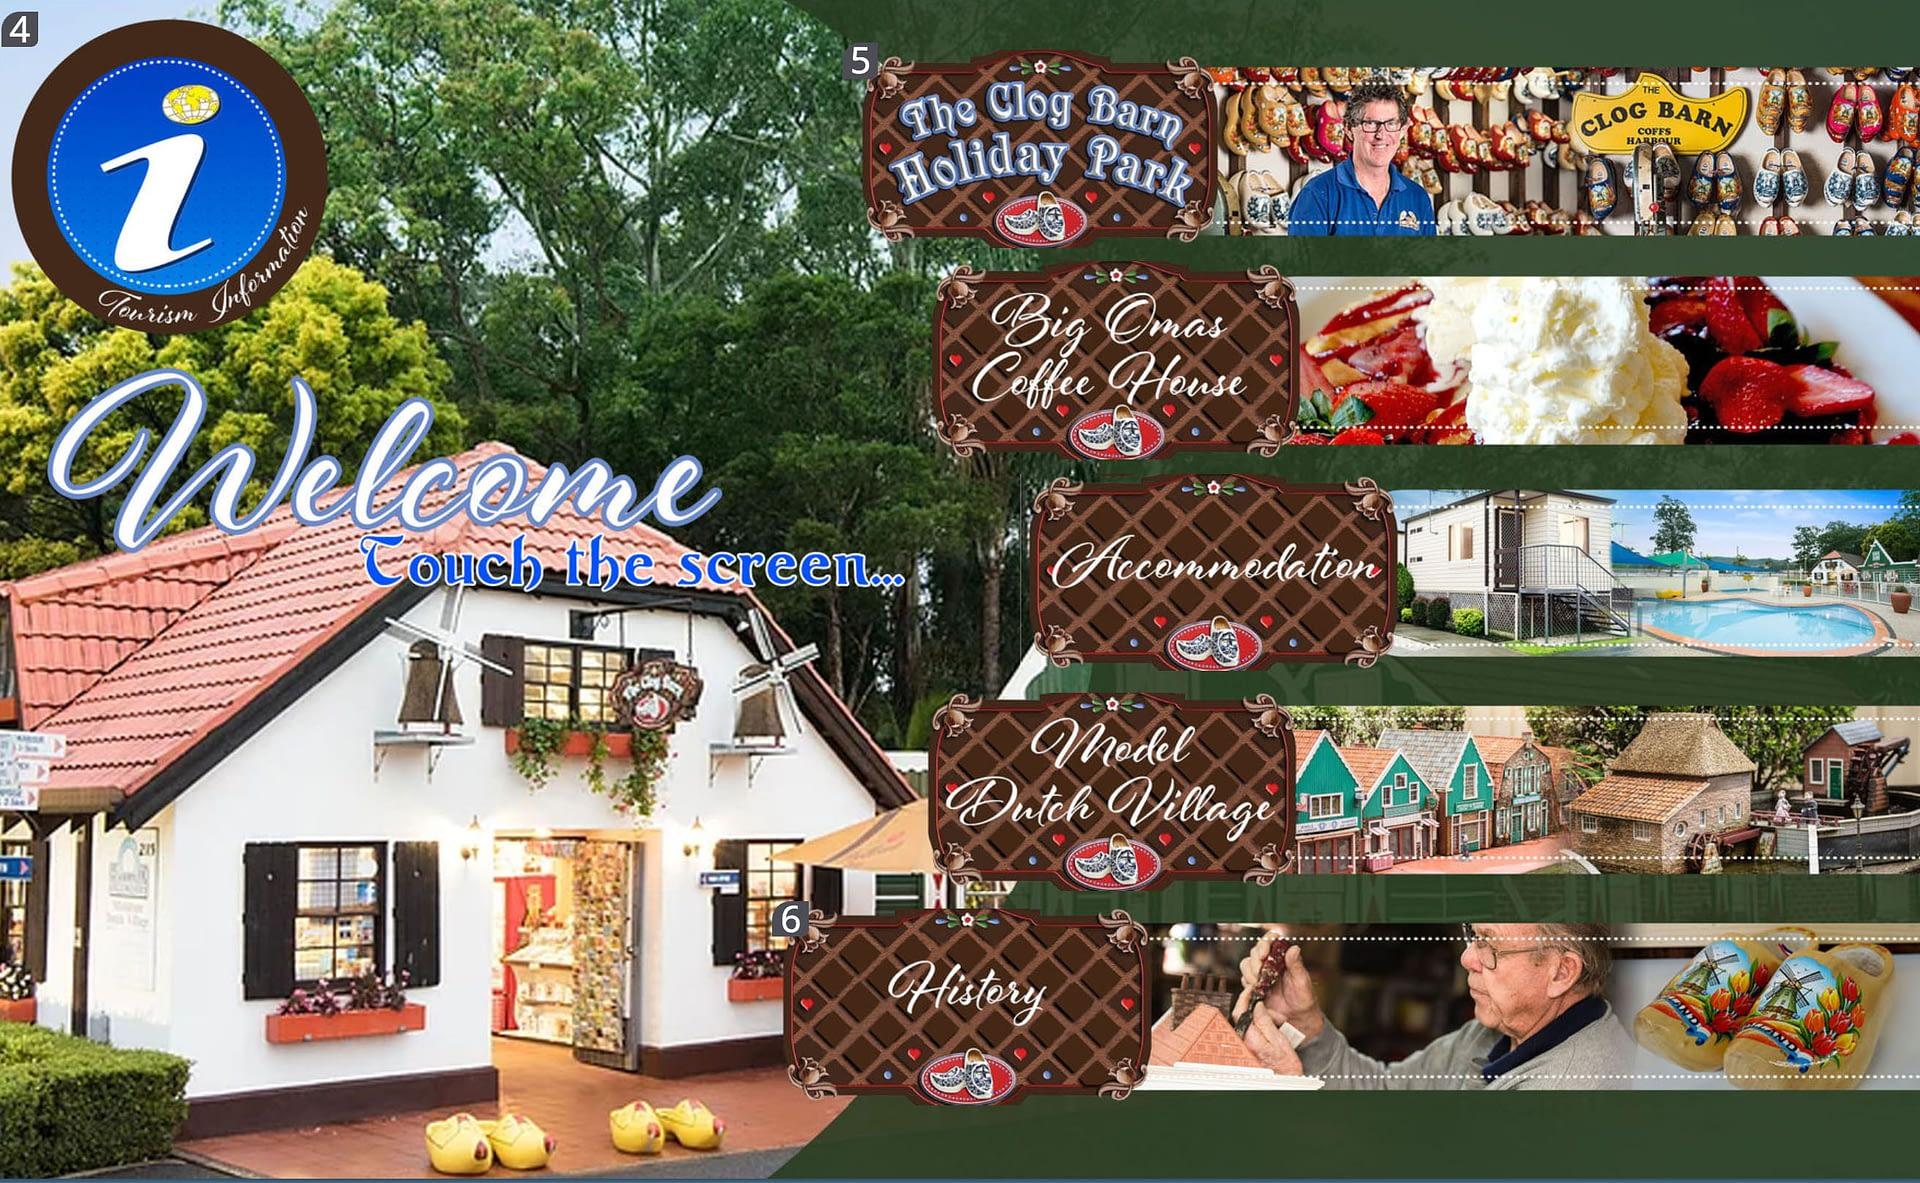 The Clog Barn Holiday Park